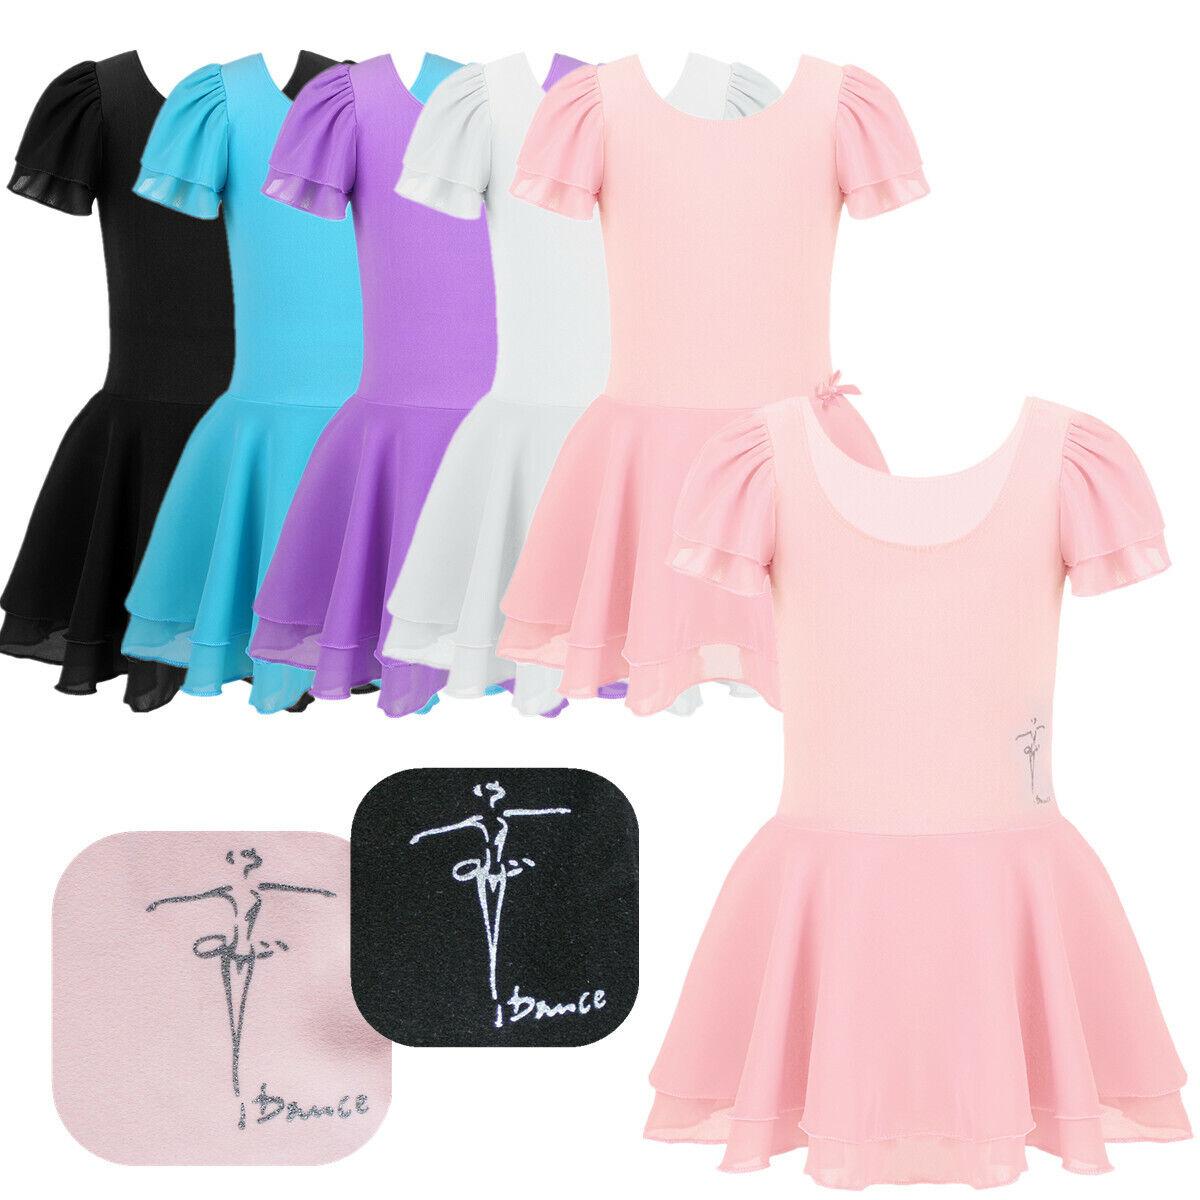 Kids Baby Girls Ballet Dance Dress Yoga Leotard Gymnastics Dancewear Tutu Skirt